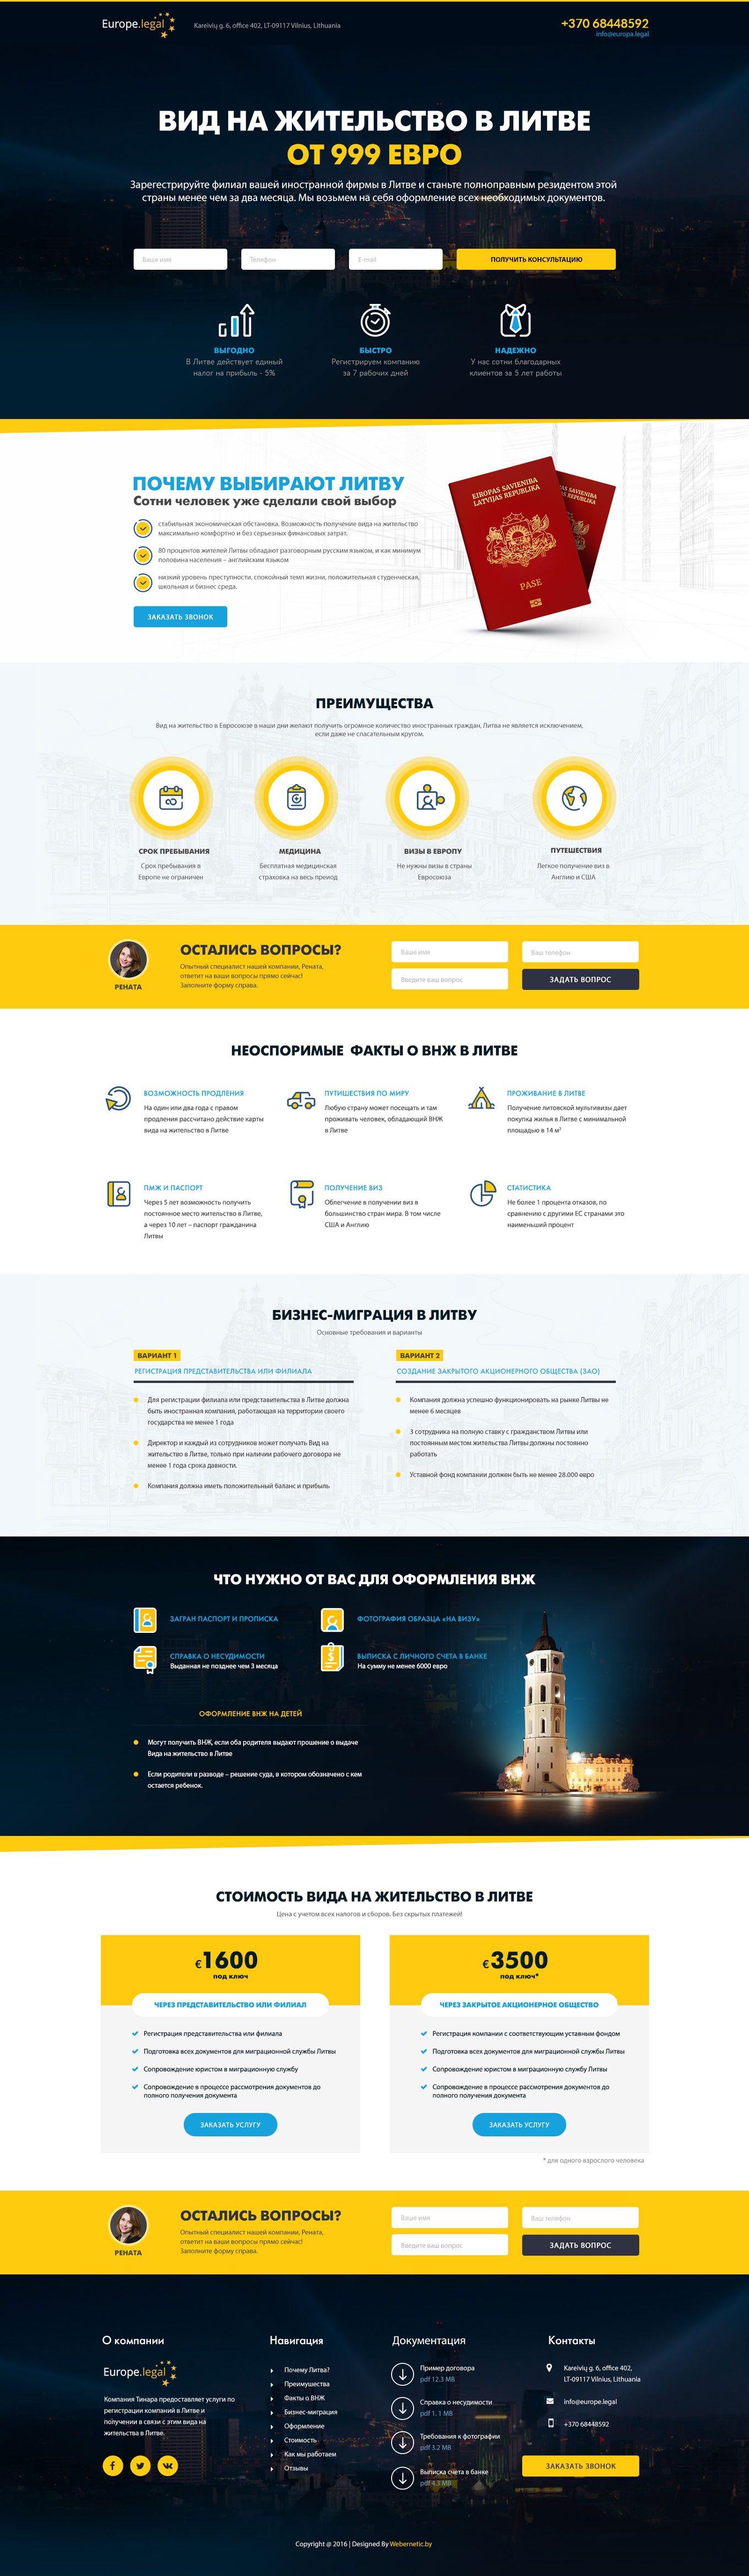 Дизайн ПК версии Landing Page: